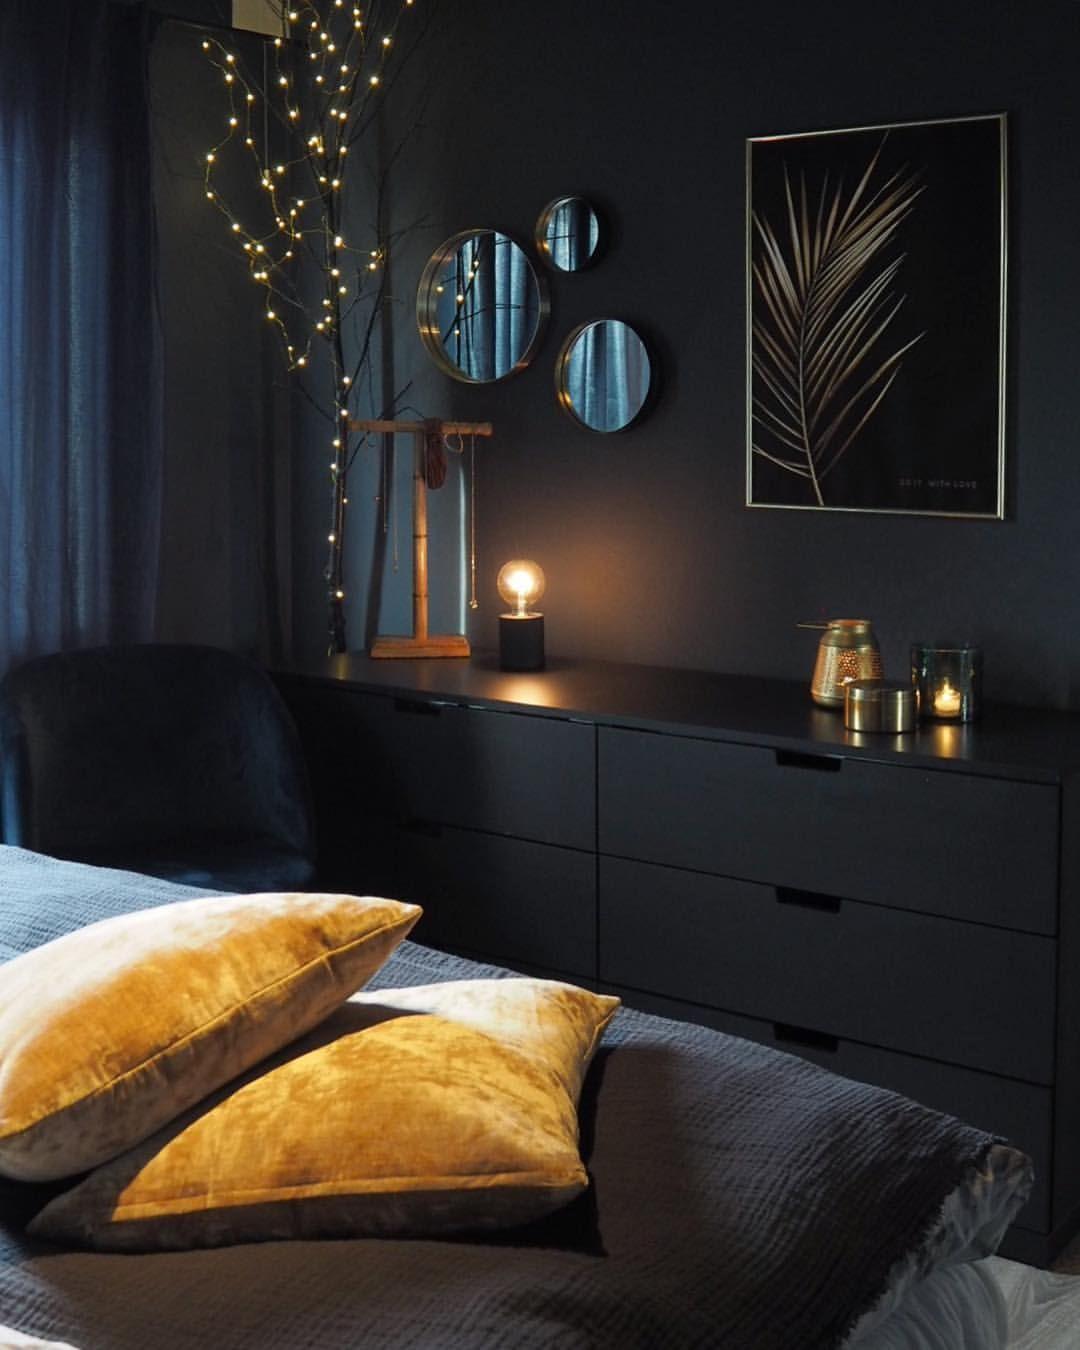 Schlafzimmer in dunklen Wandfarben Dunkle wandfarbe